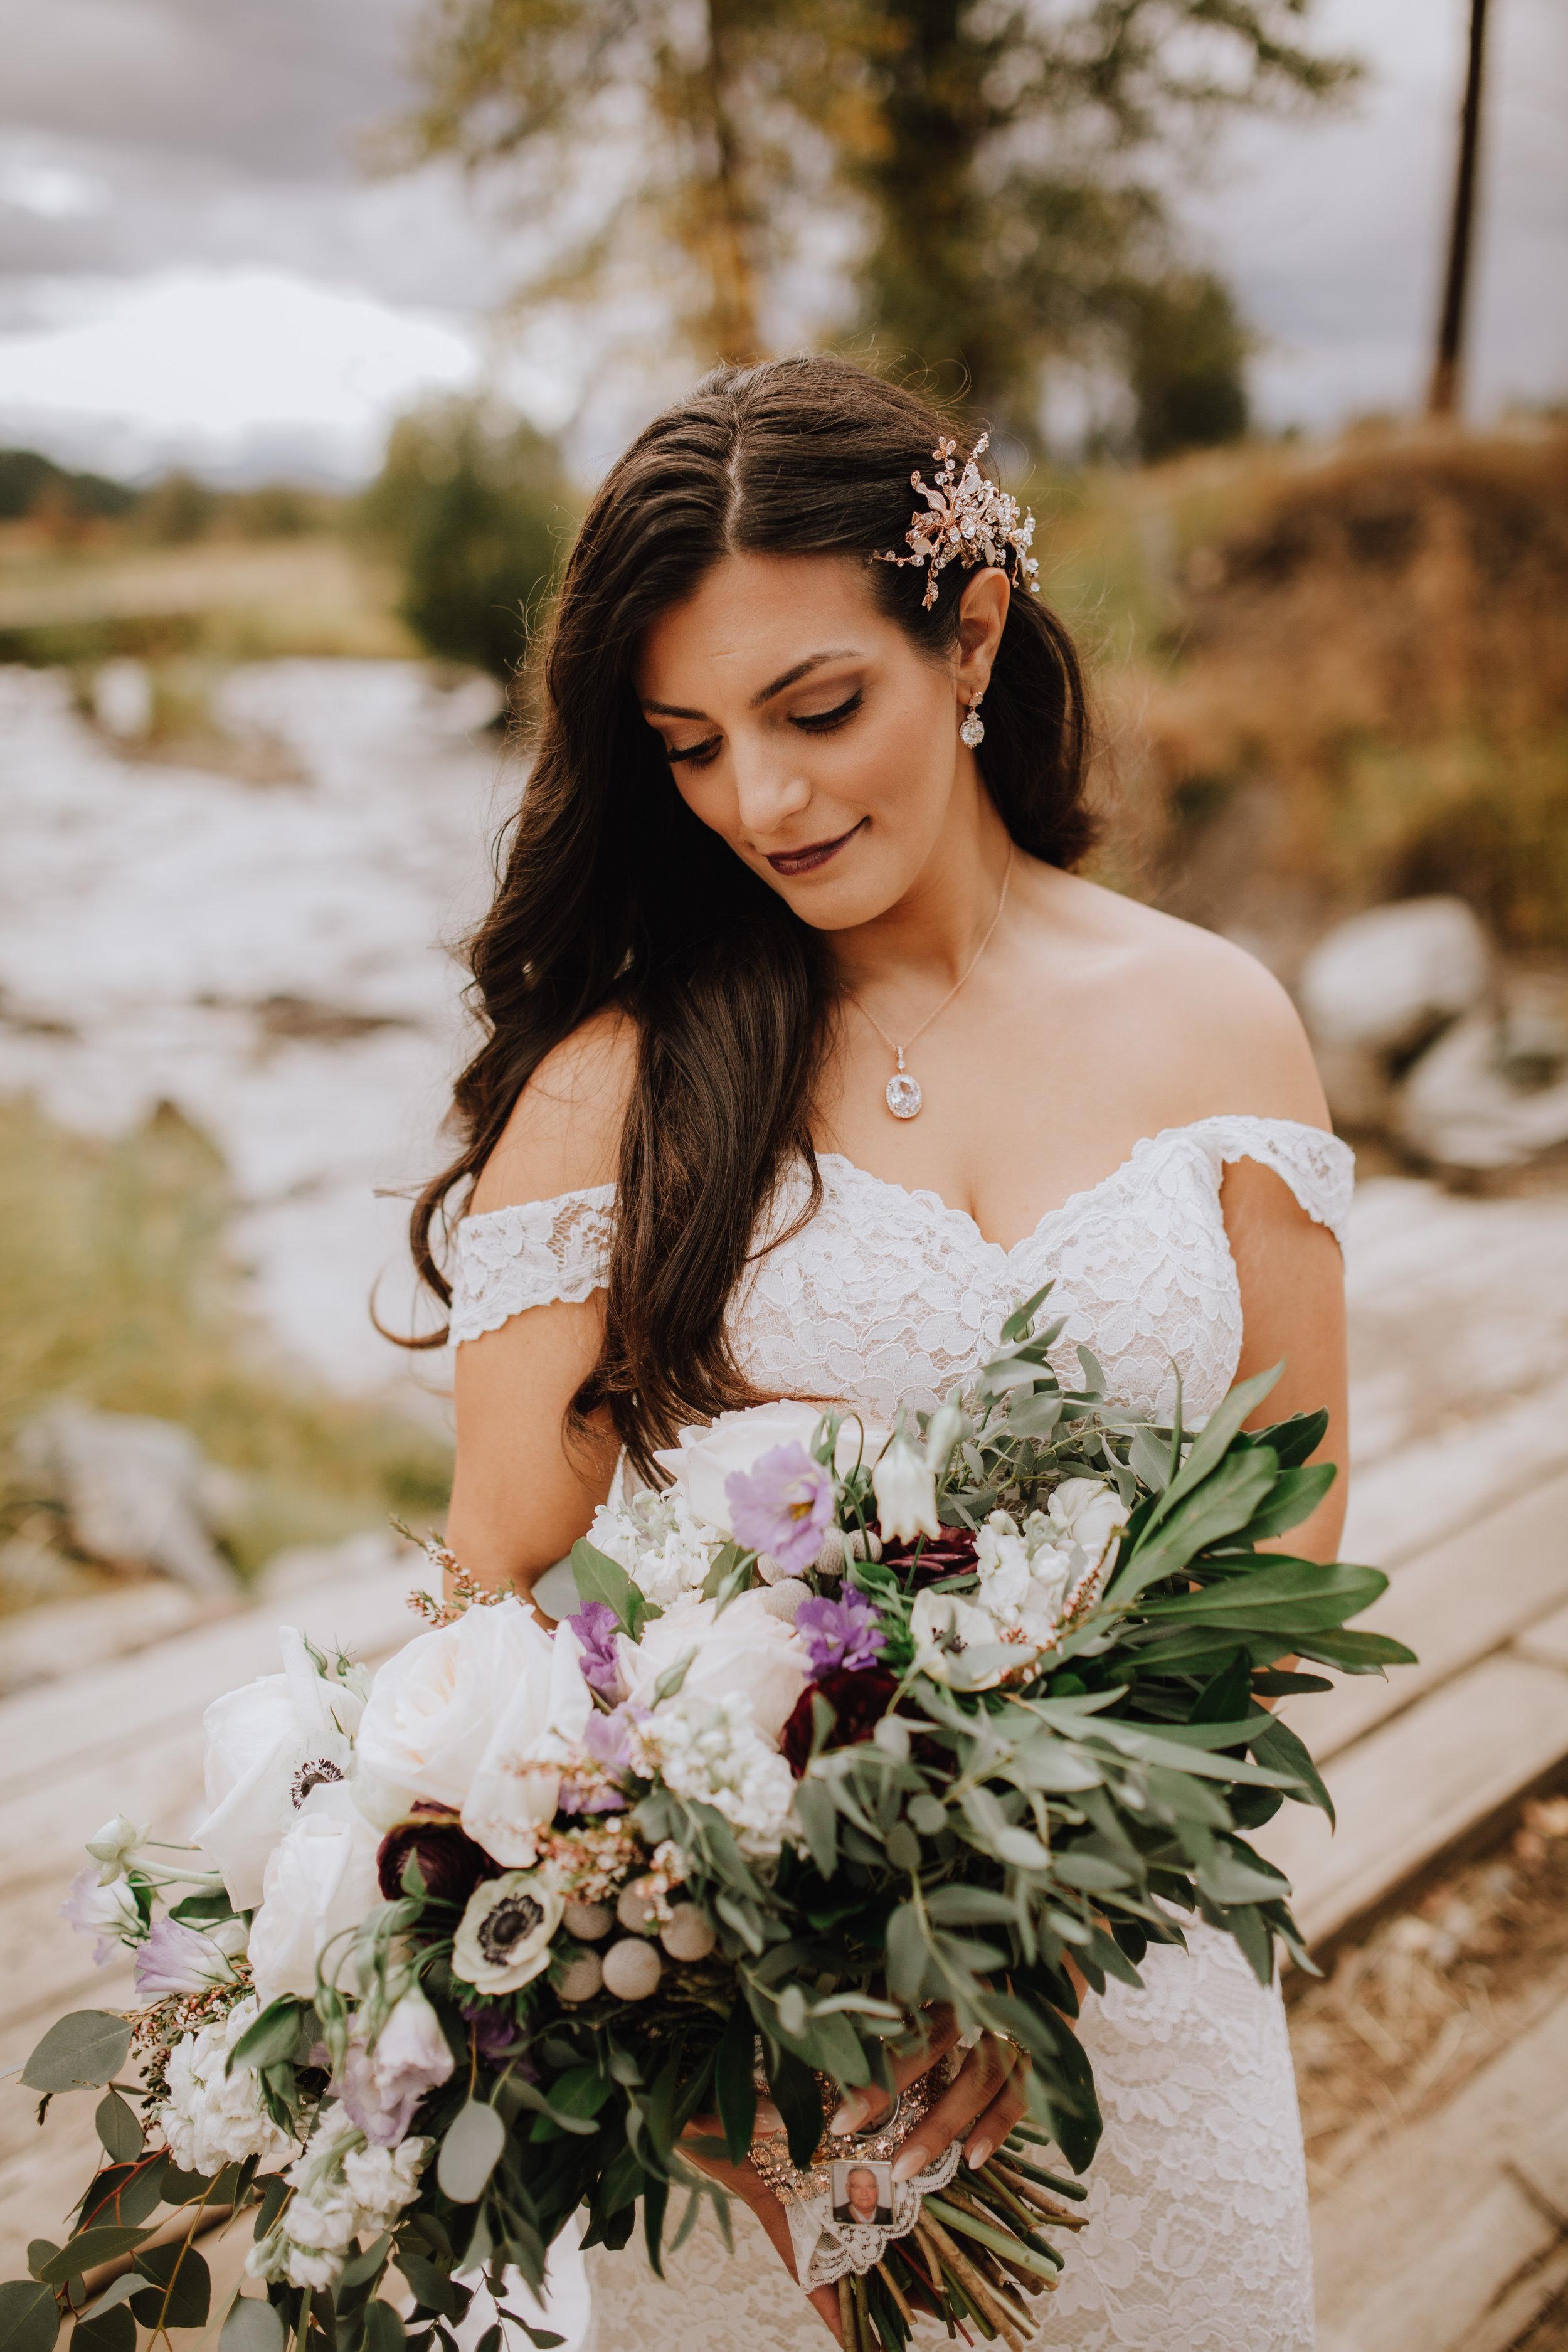 Kurt + Melissa 4 - Bridal Portraits-24.jpg